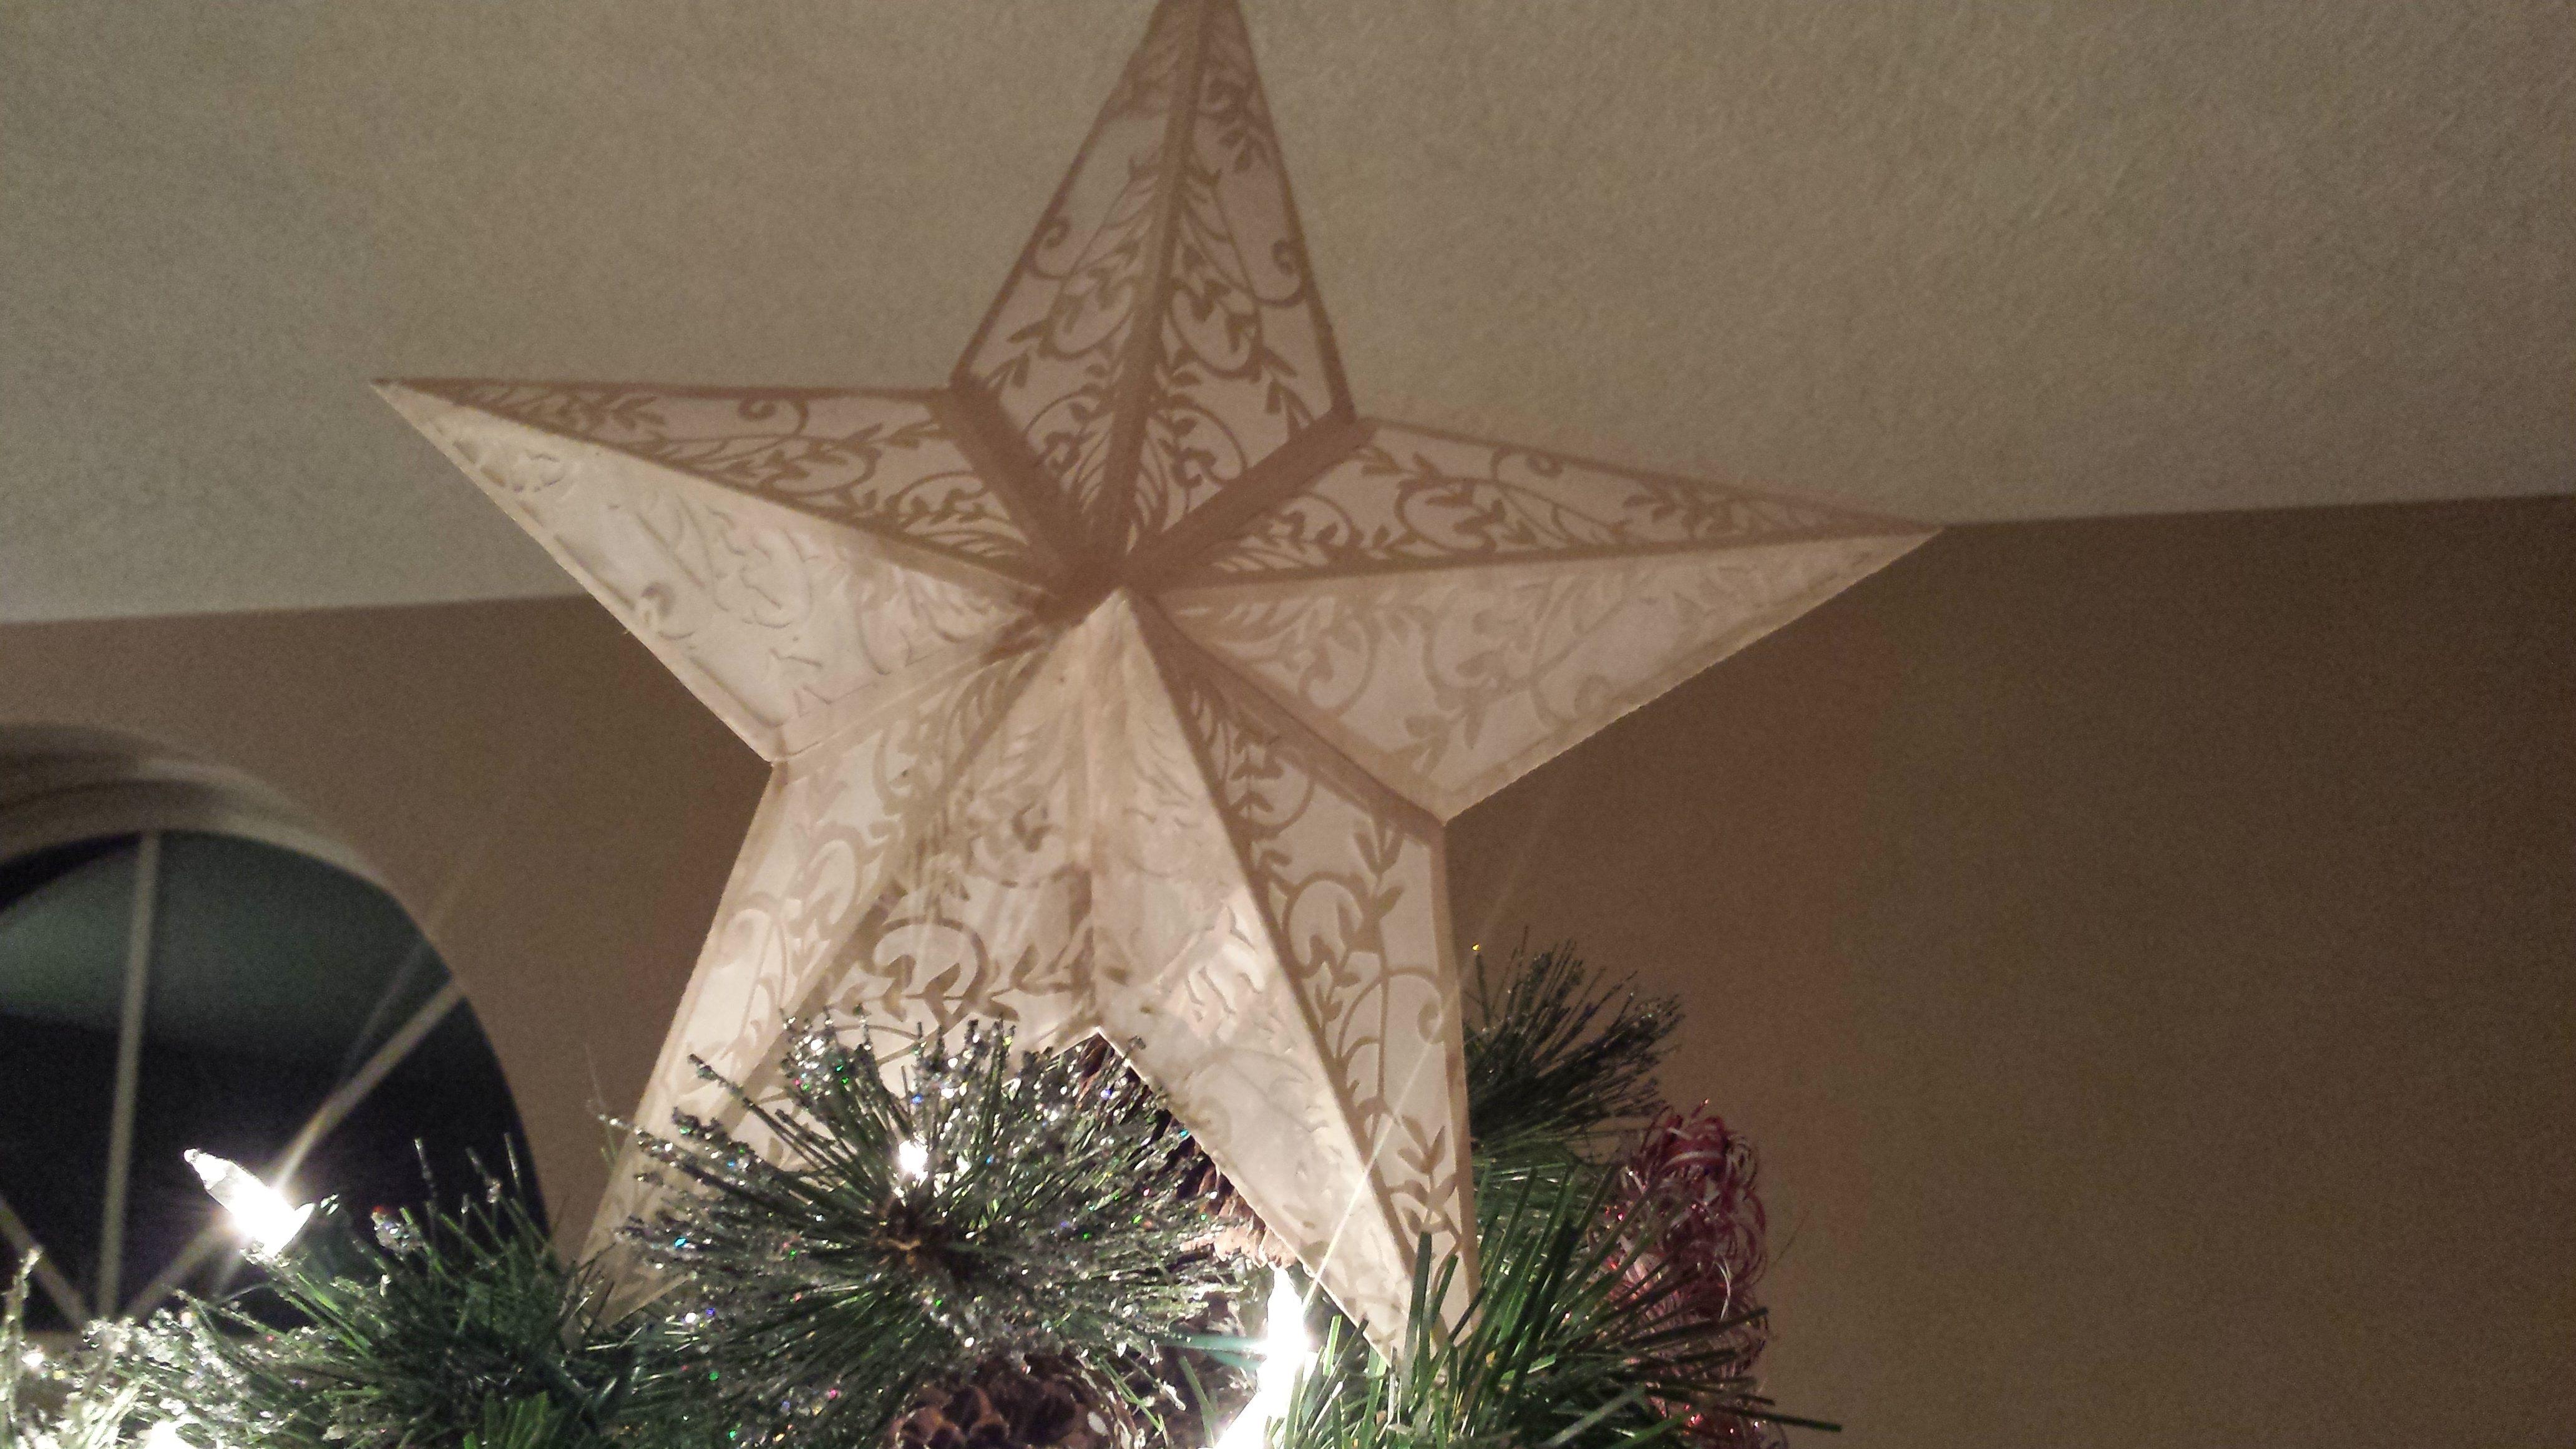 Diy Christmas Star Lantern Tutorial And Design Download Crafty Oils